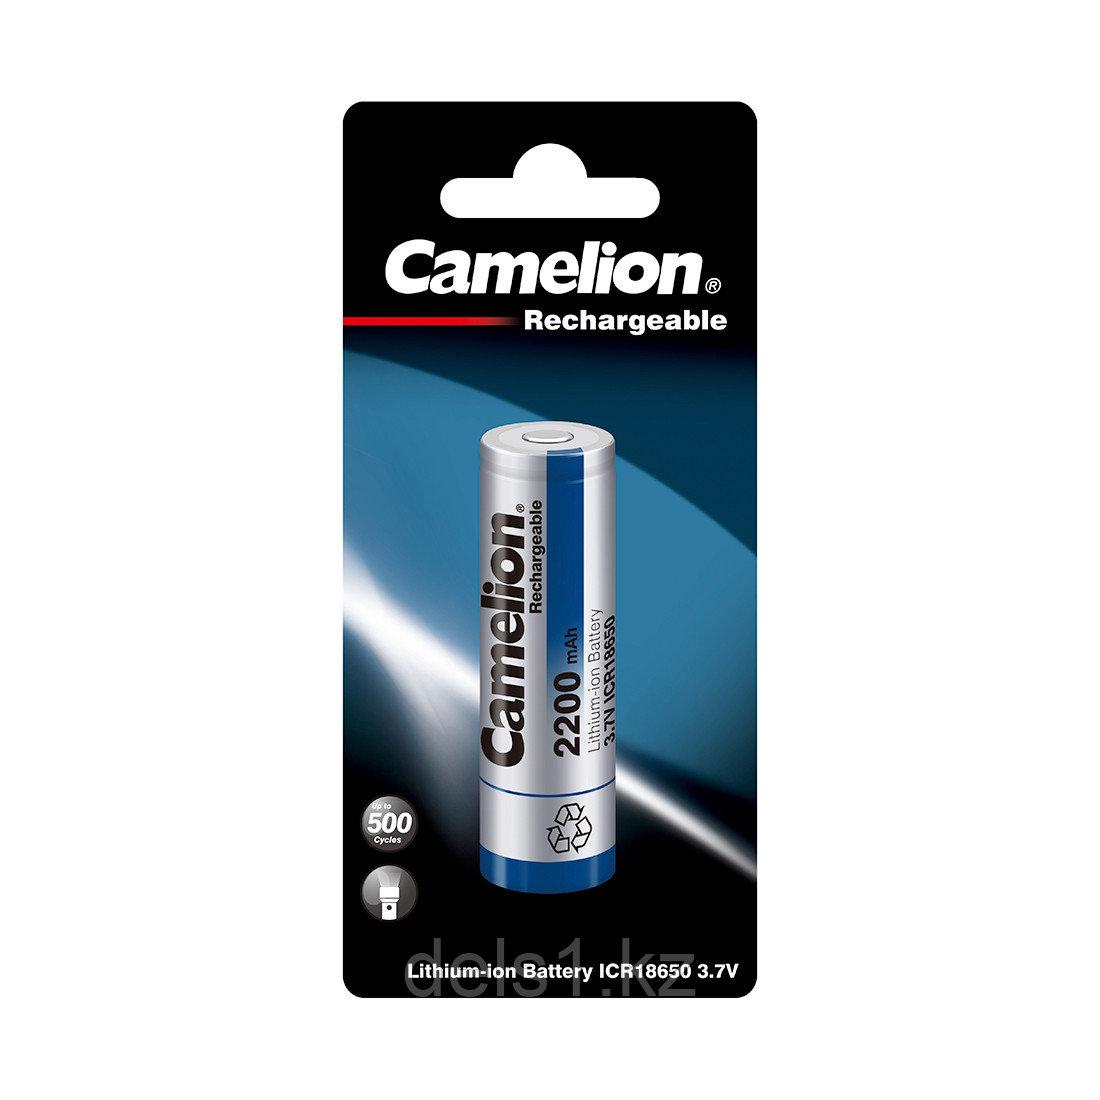 Аккумулятор, CAMELION, ICR18650F-22-BP, Lithium, 3,7V, 2200 mAh, 1 шт., Блистер, Серебристый